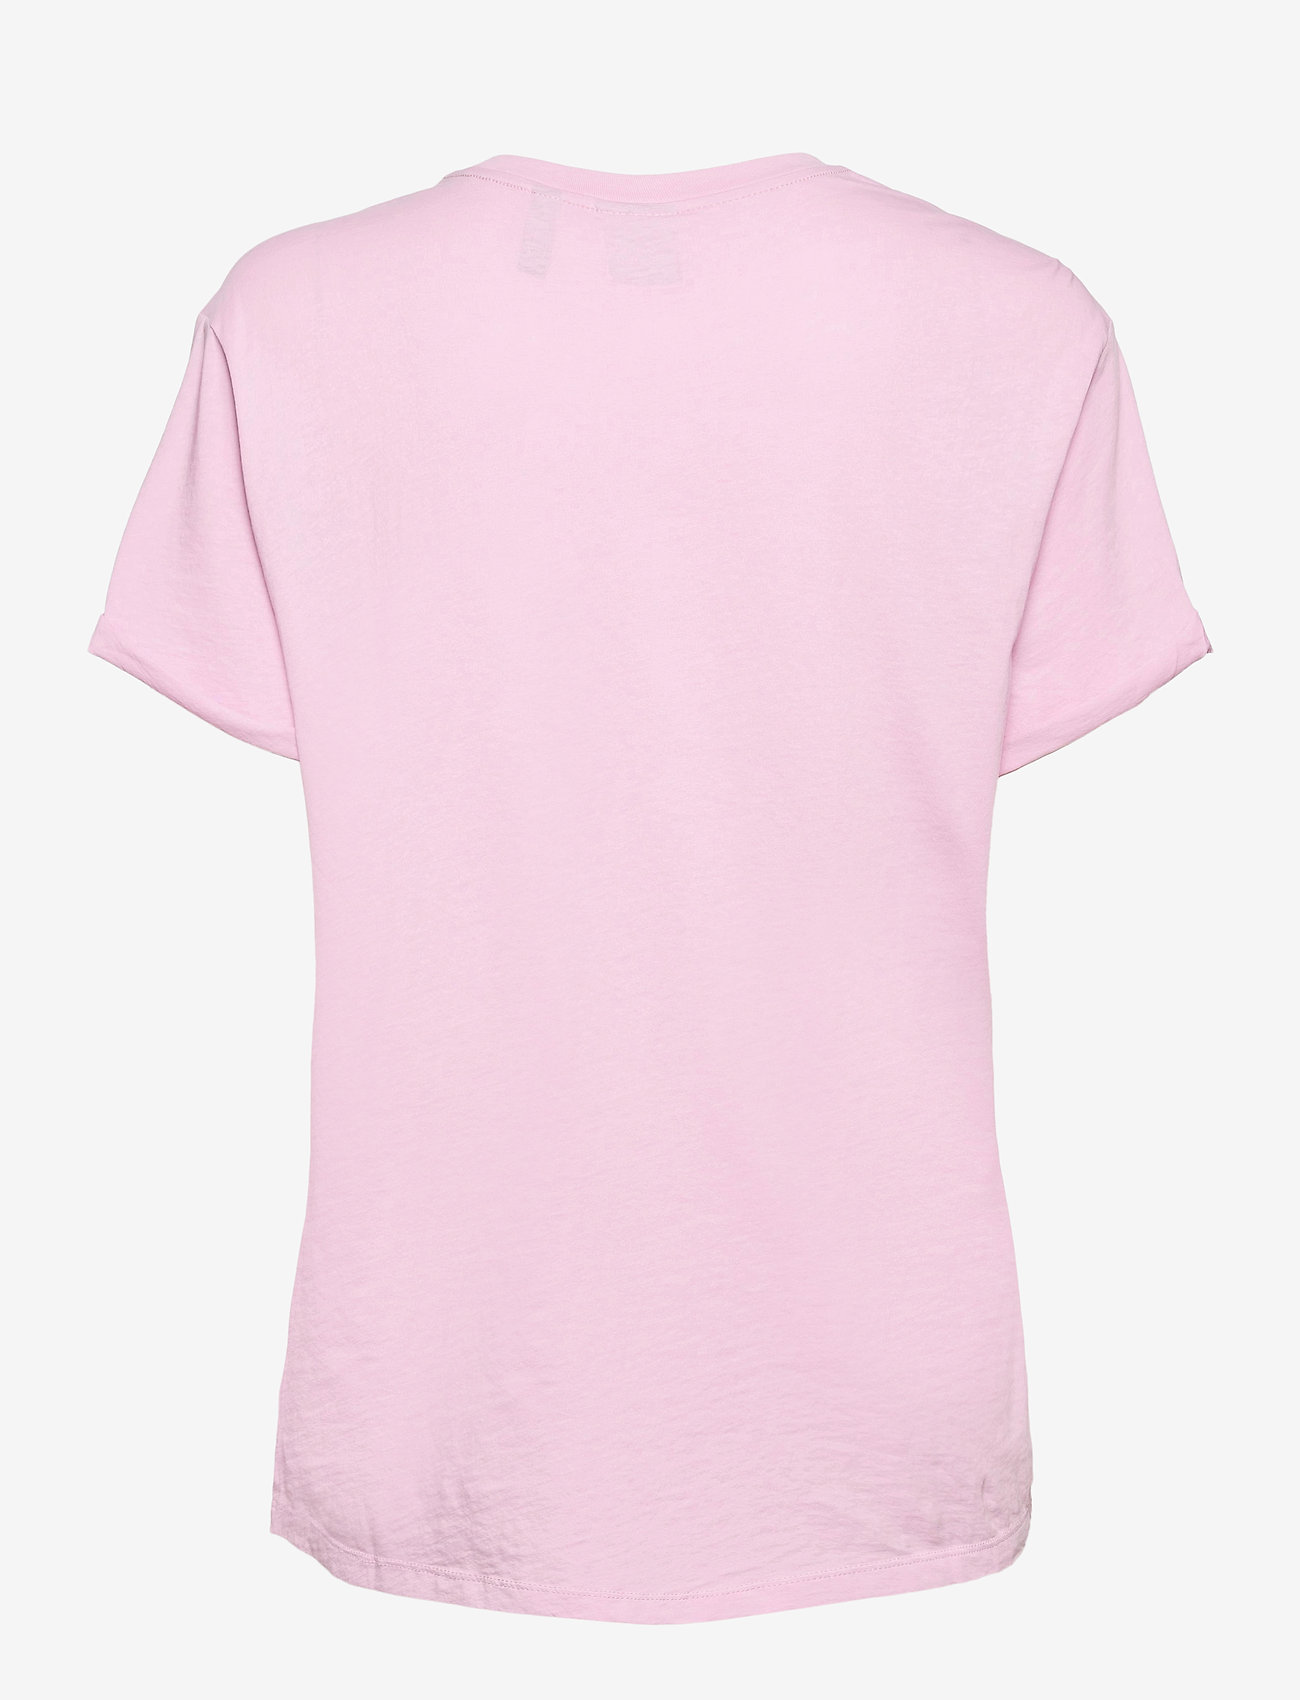 G-star RAW - Lash fem loose r t wmn s\s - t-shirts - lavender pink - 1